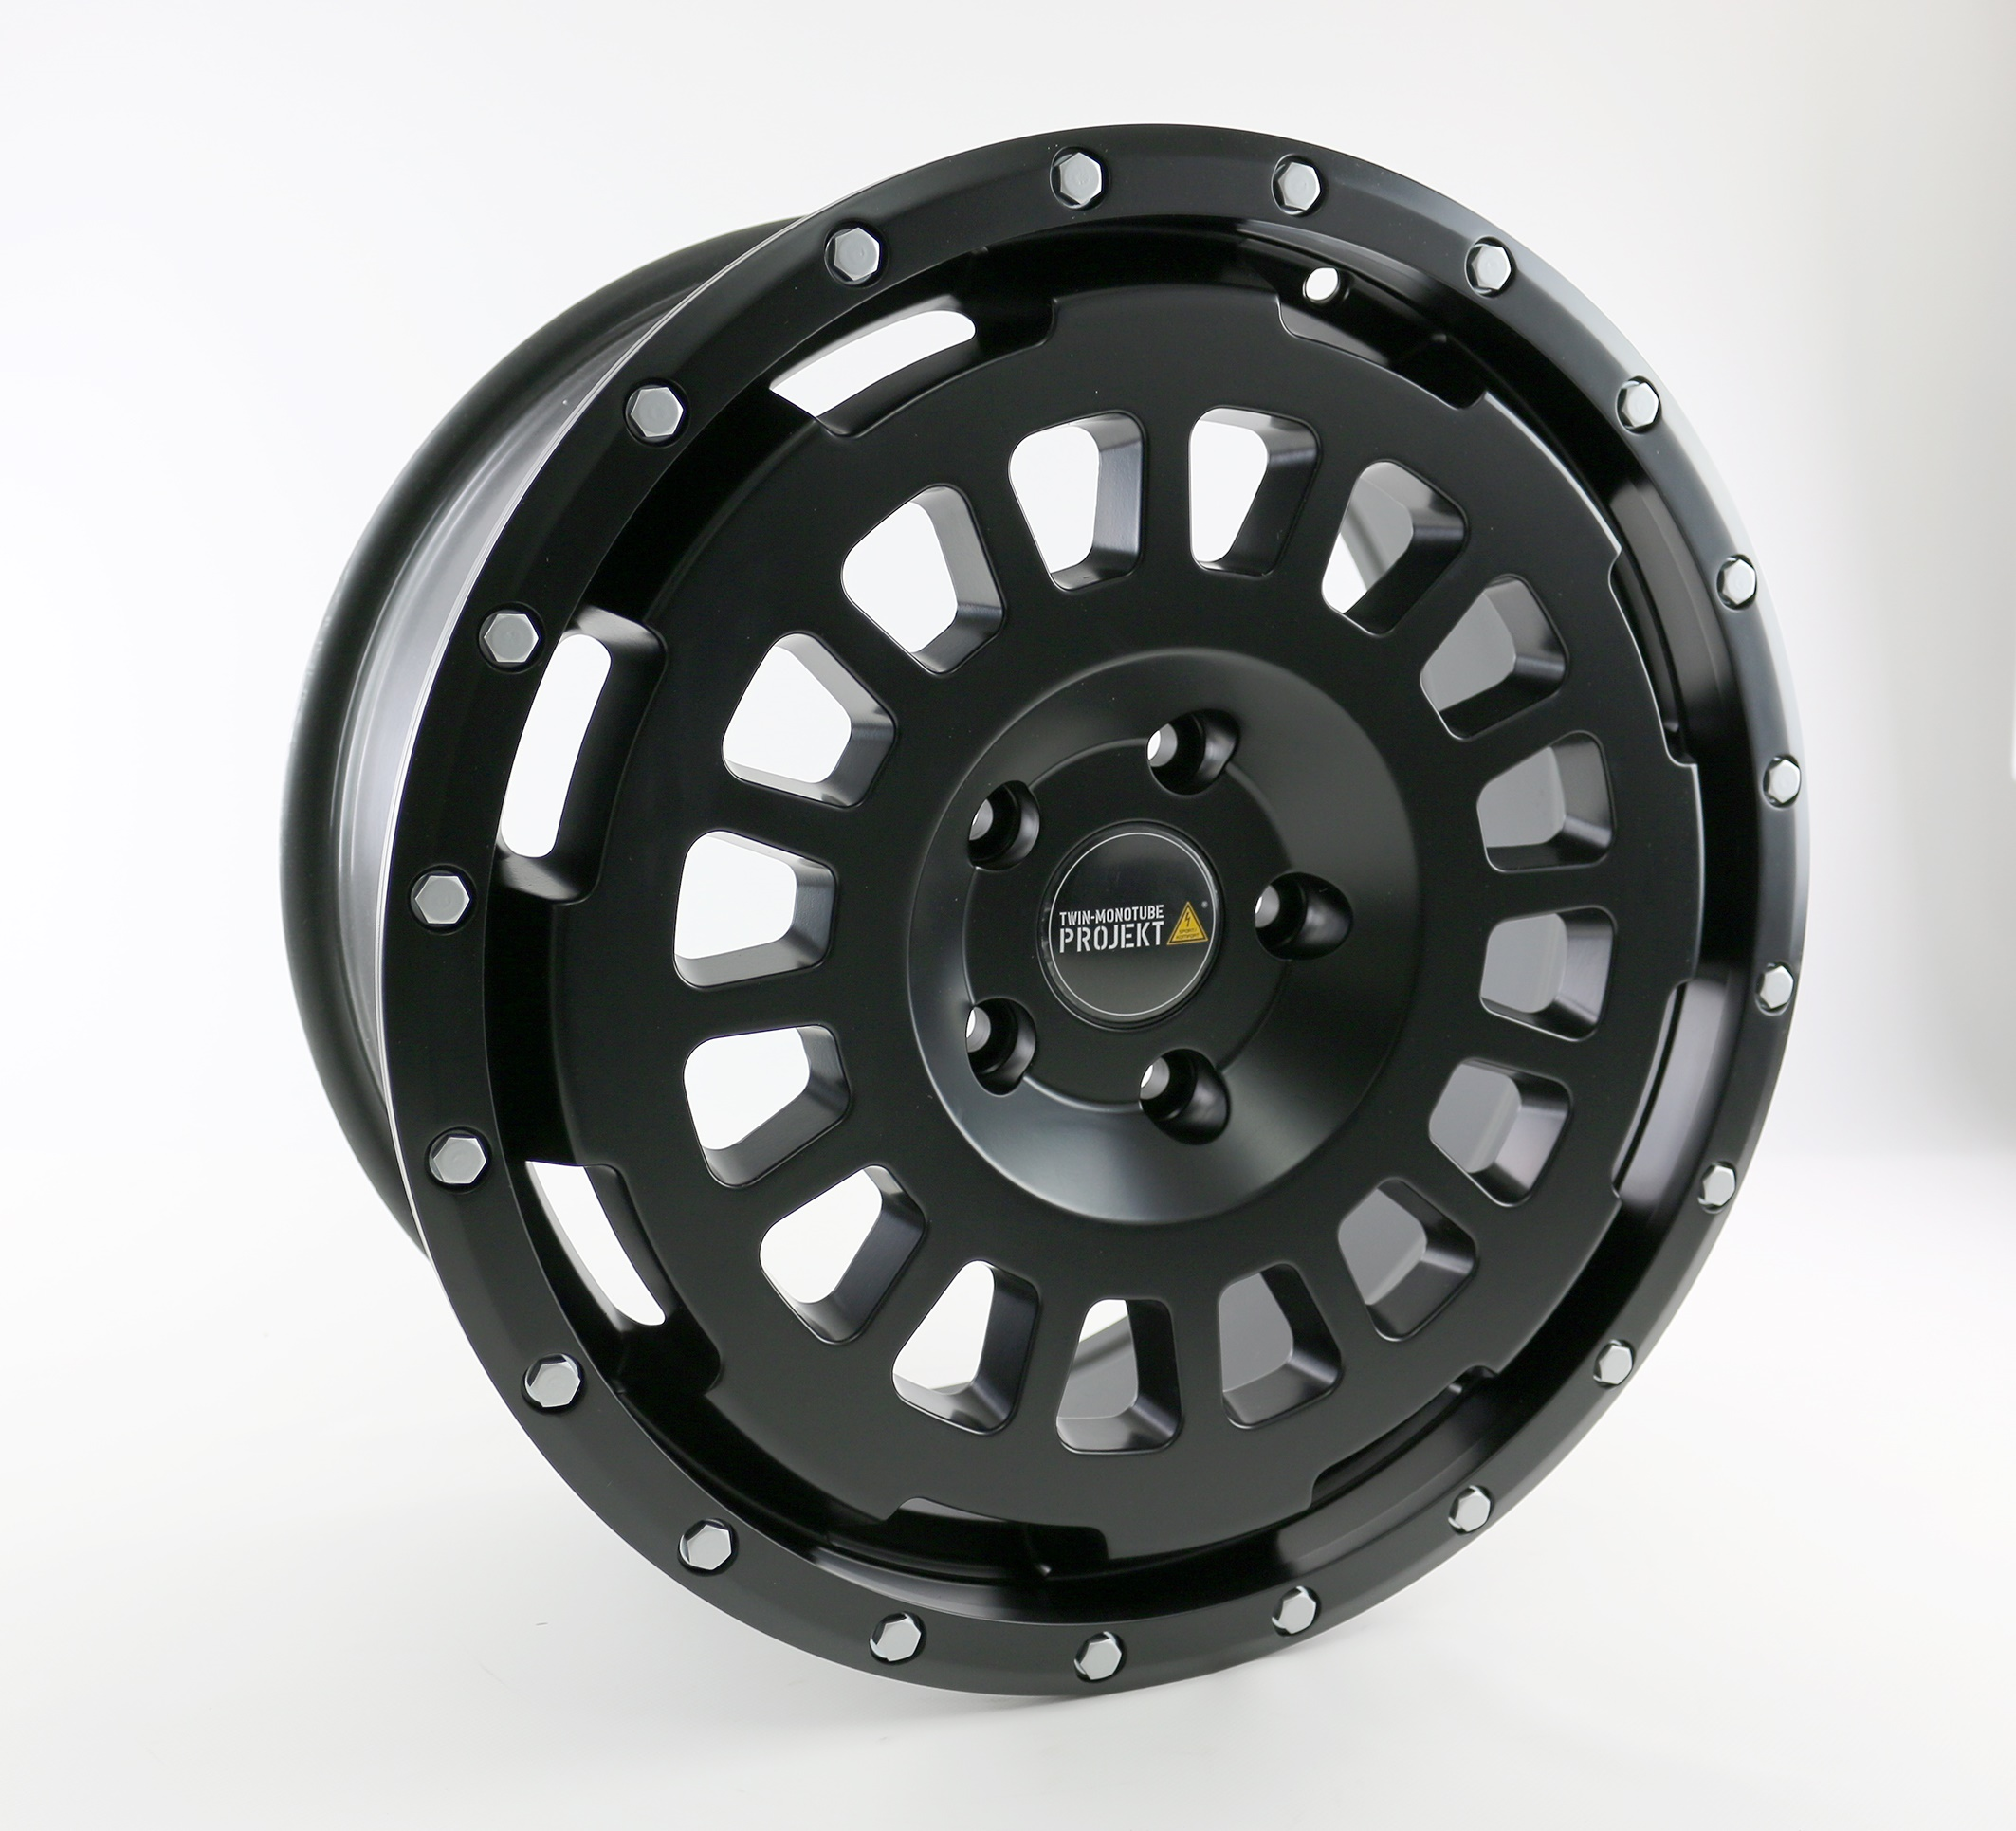 4x Offroad Allterrain Felge 8x18 schwarz für Mercedes V-Klasse Vito